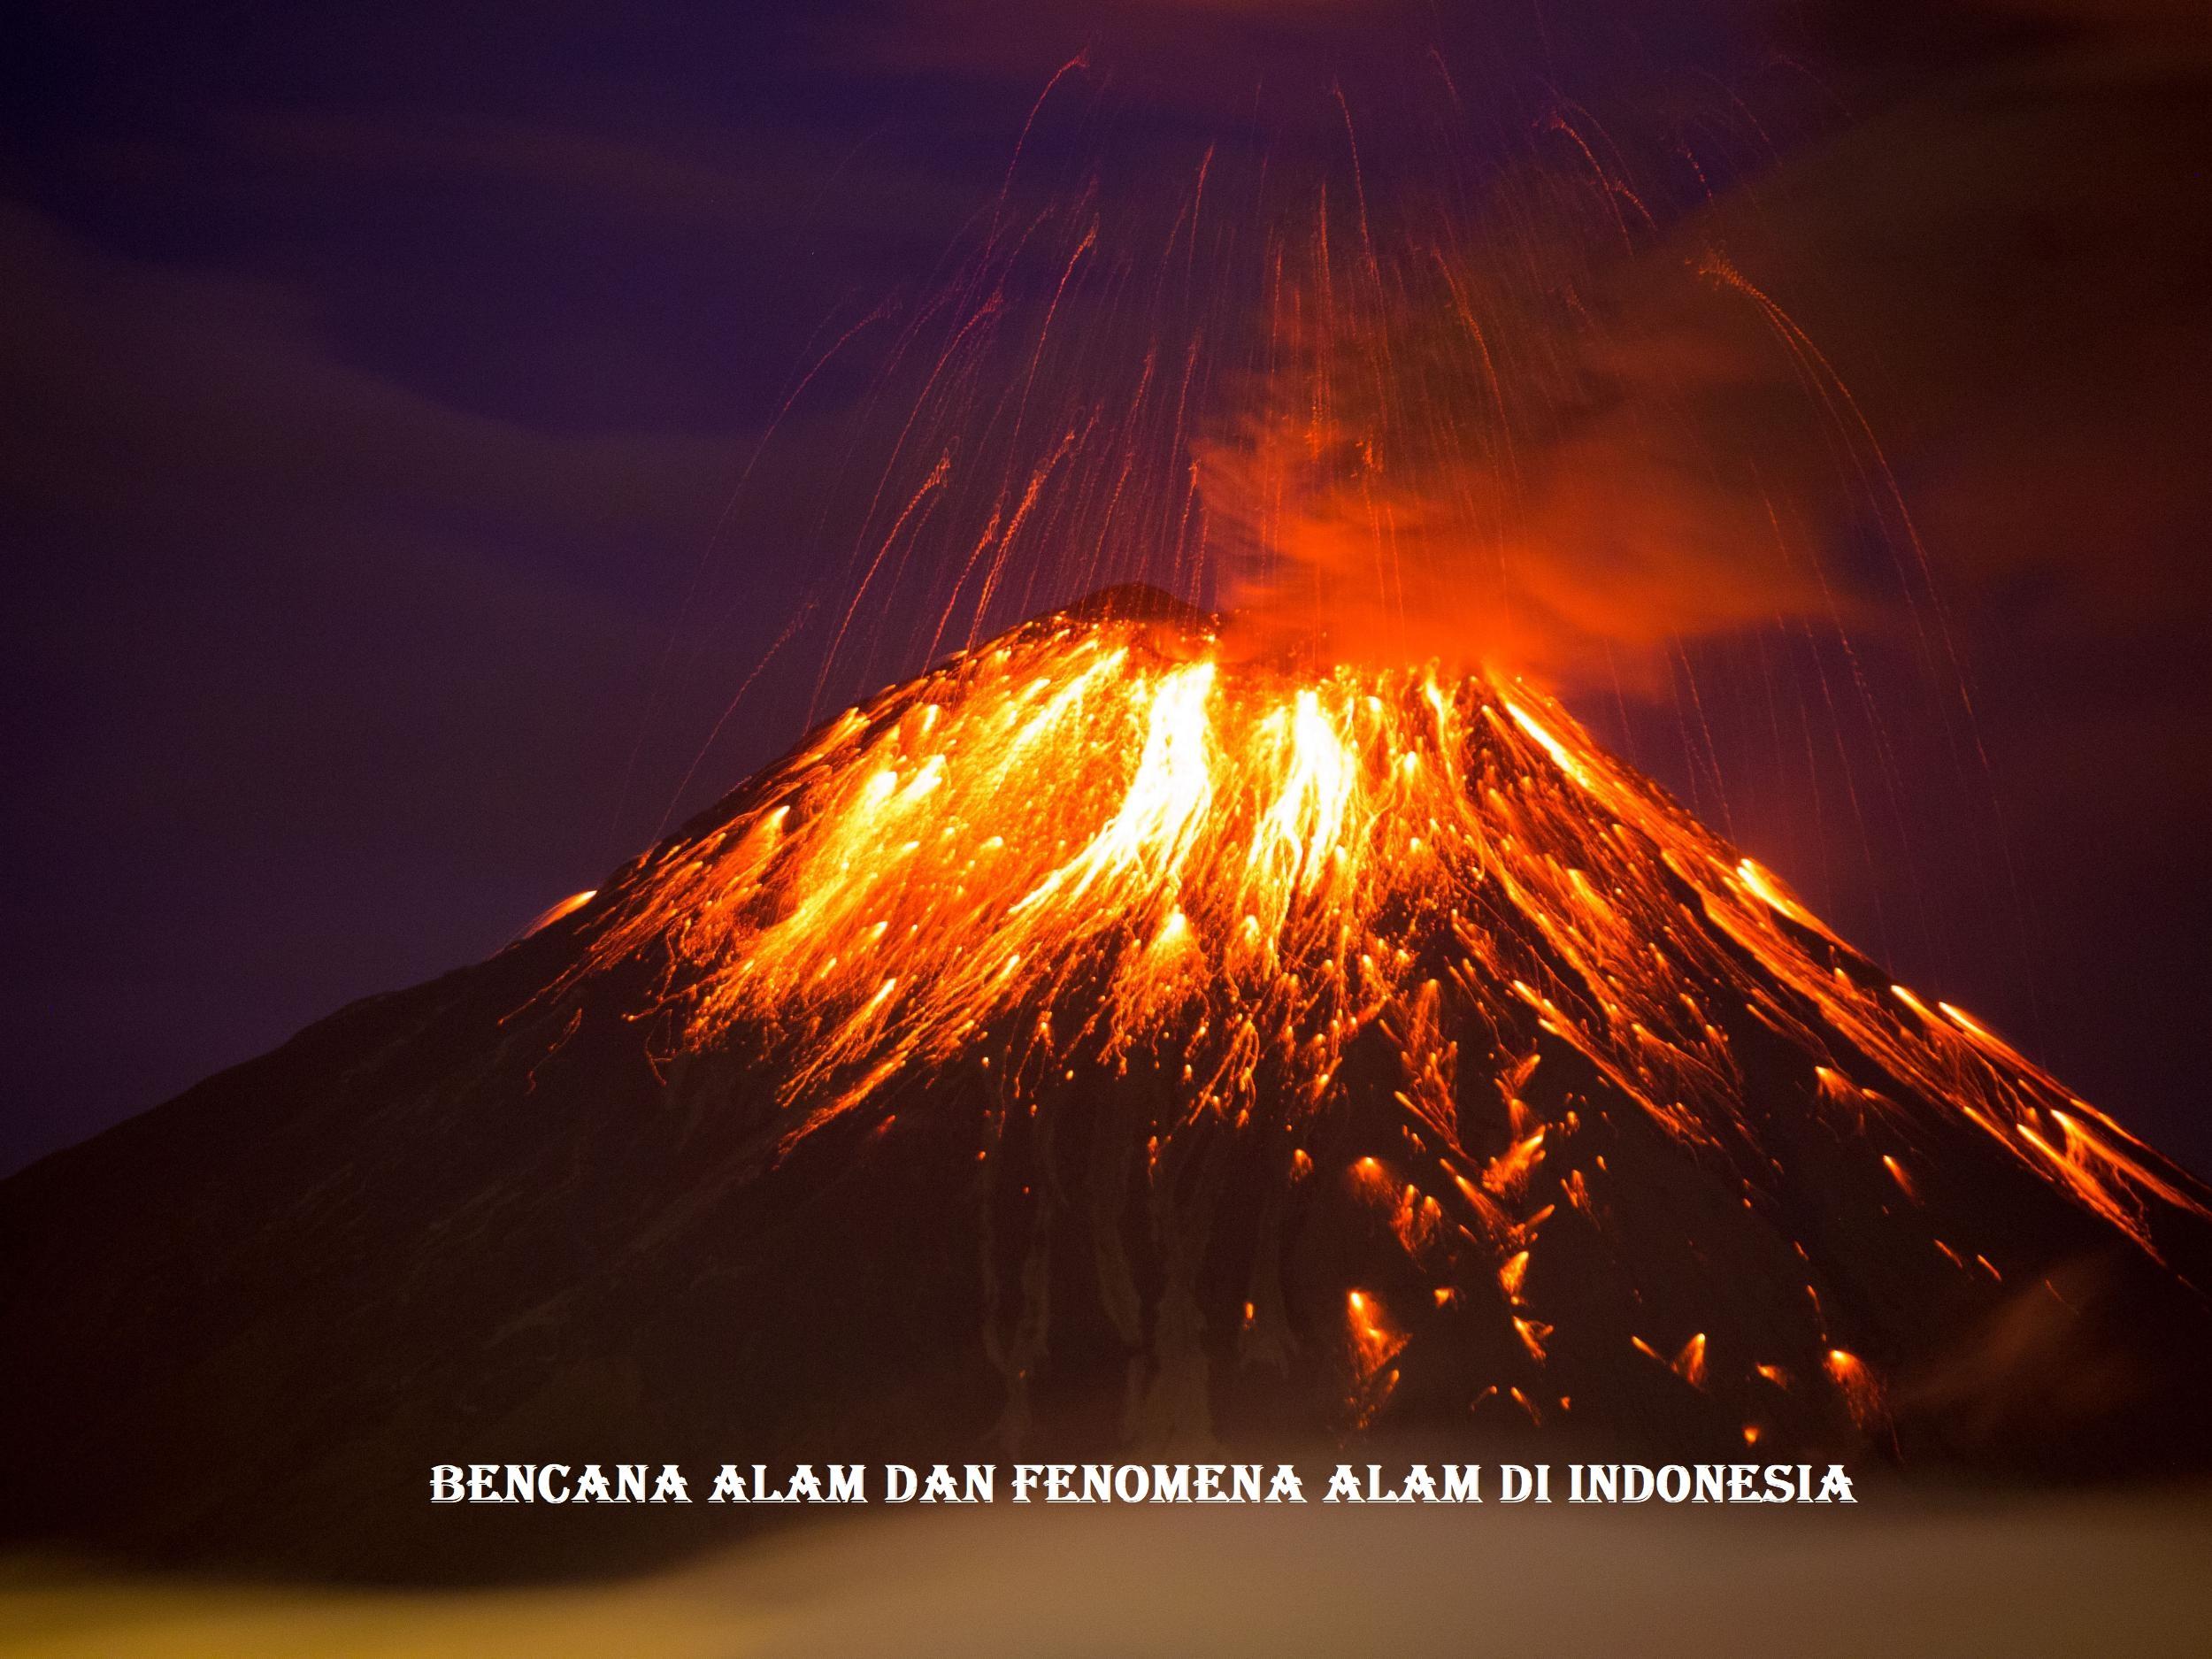 Bencana Alam dan Fenomena Alam di Indonesia